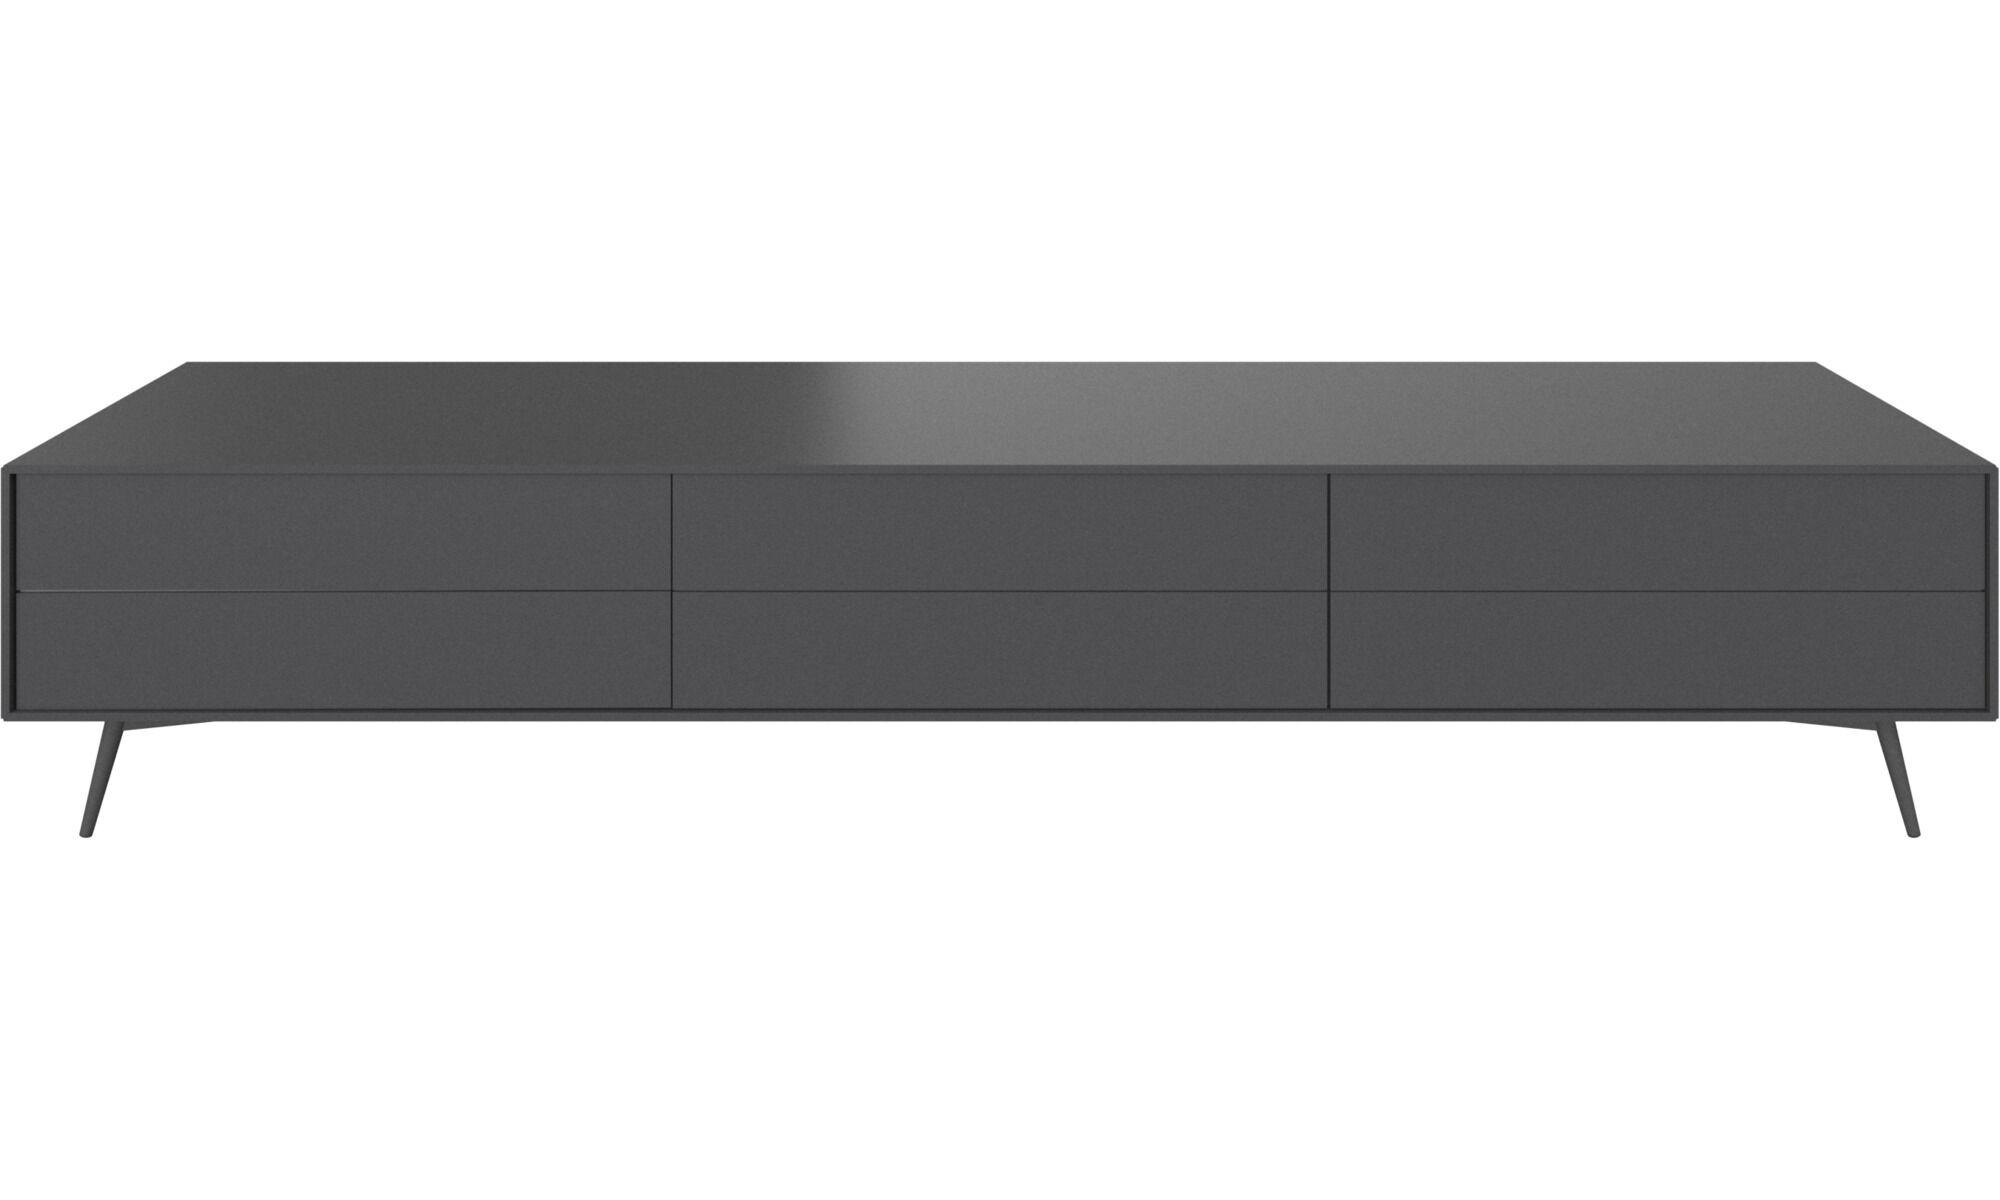 Fermo TV-/HiFi-Modul